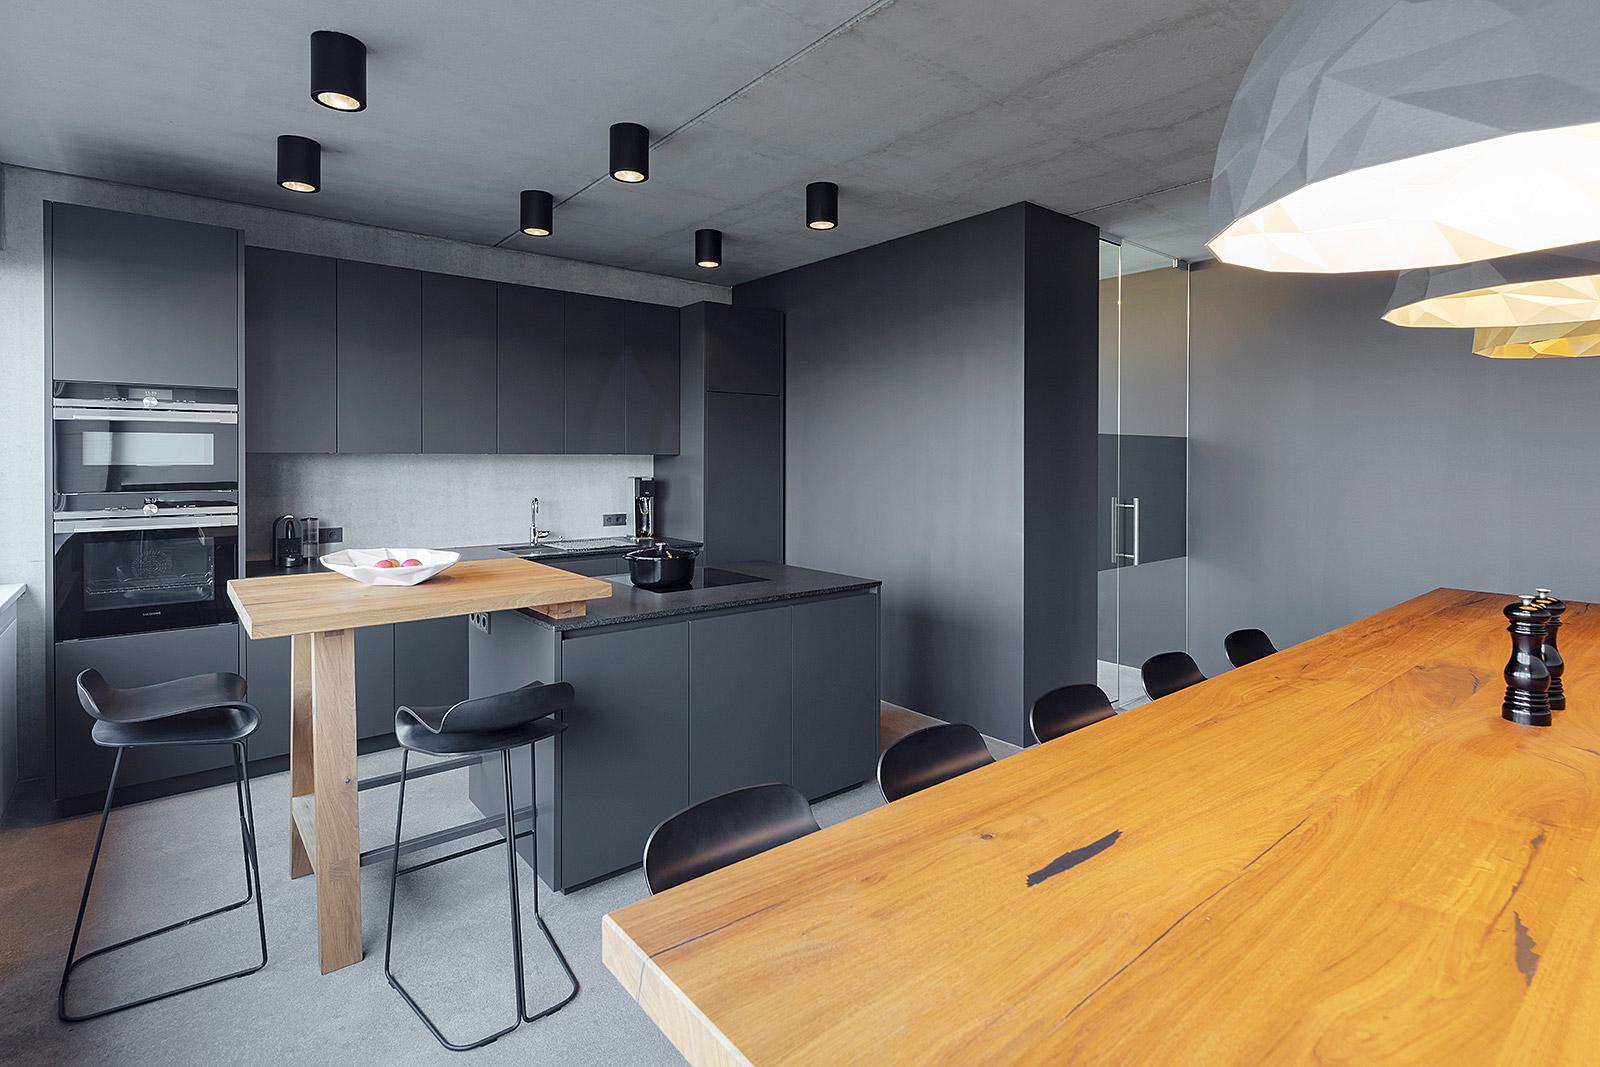 Mayr&Glatzl Innenarchitektur Foto Küche